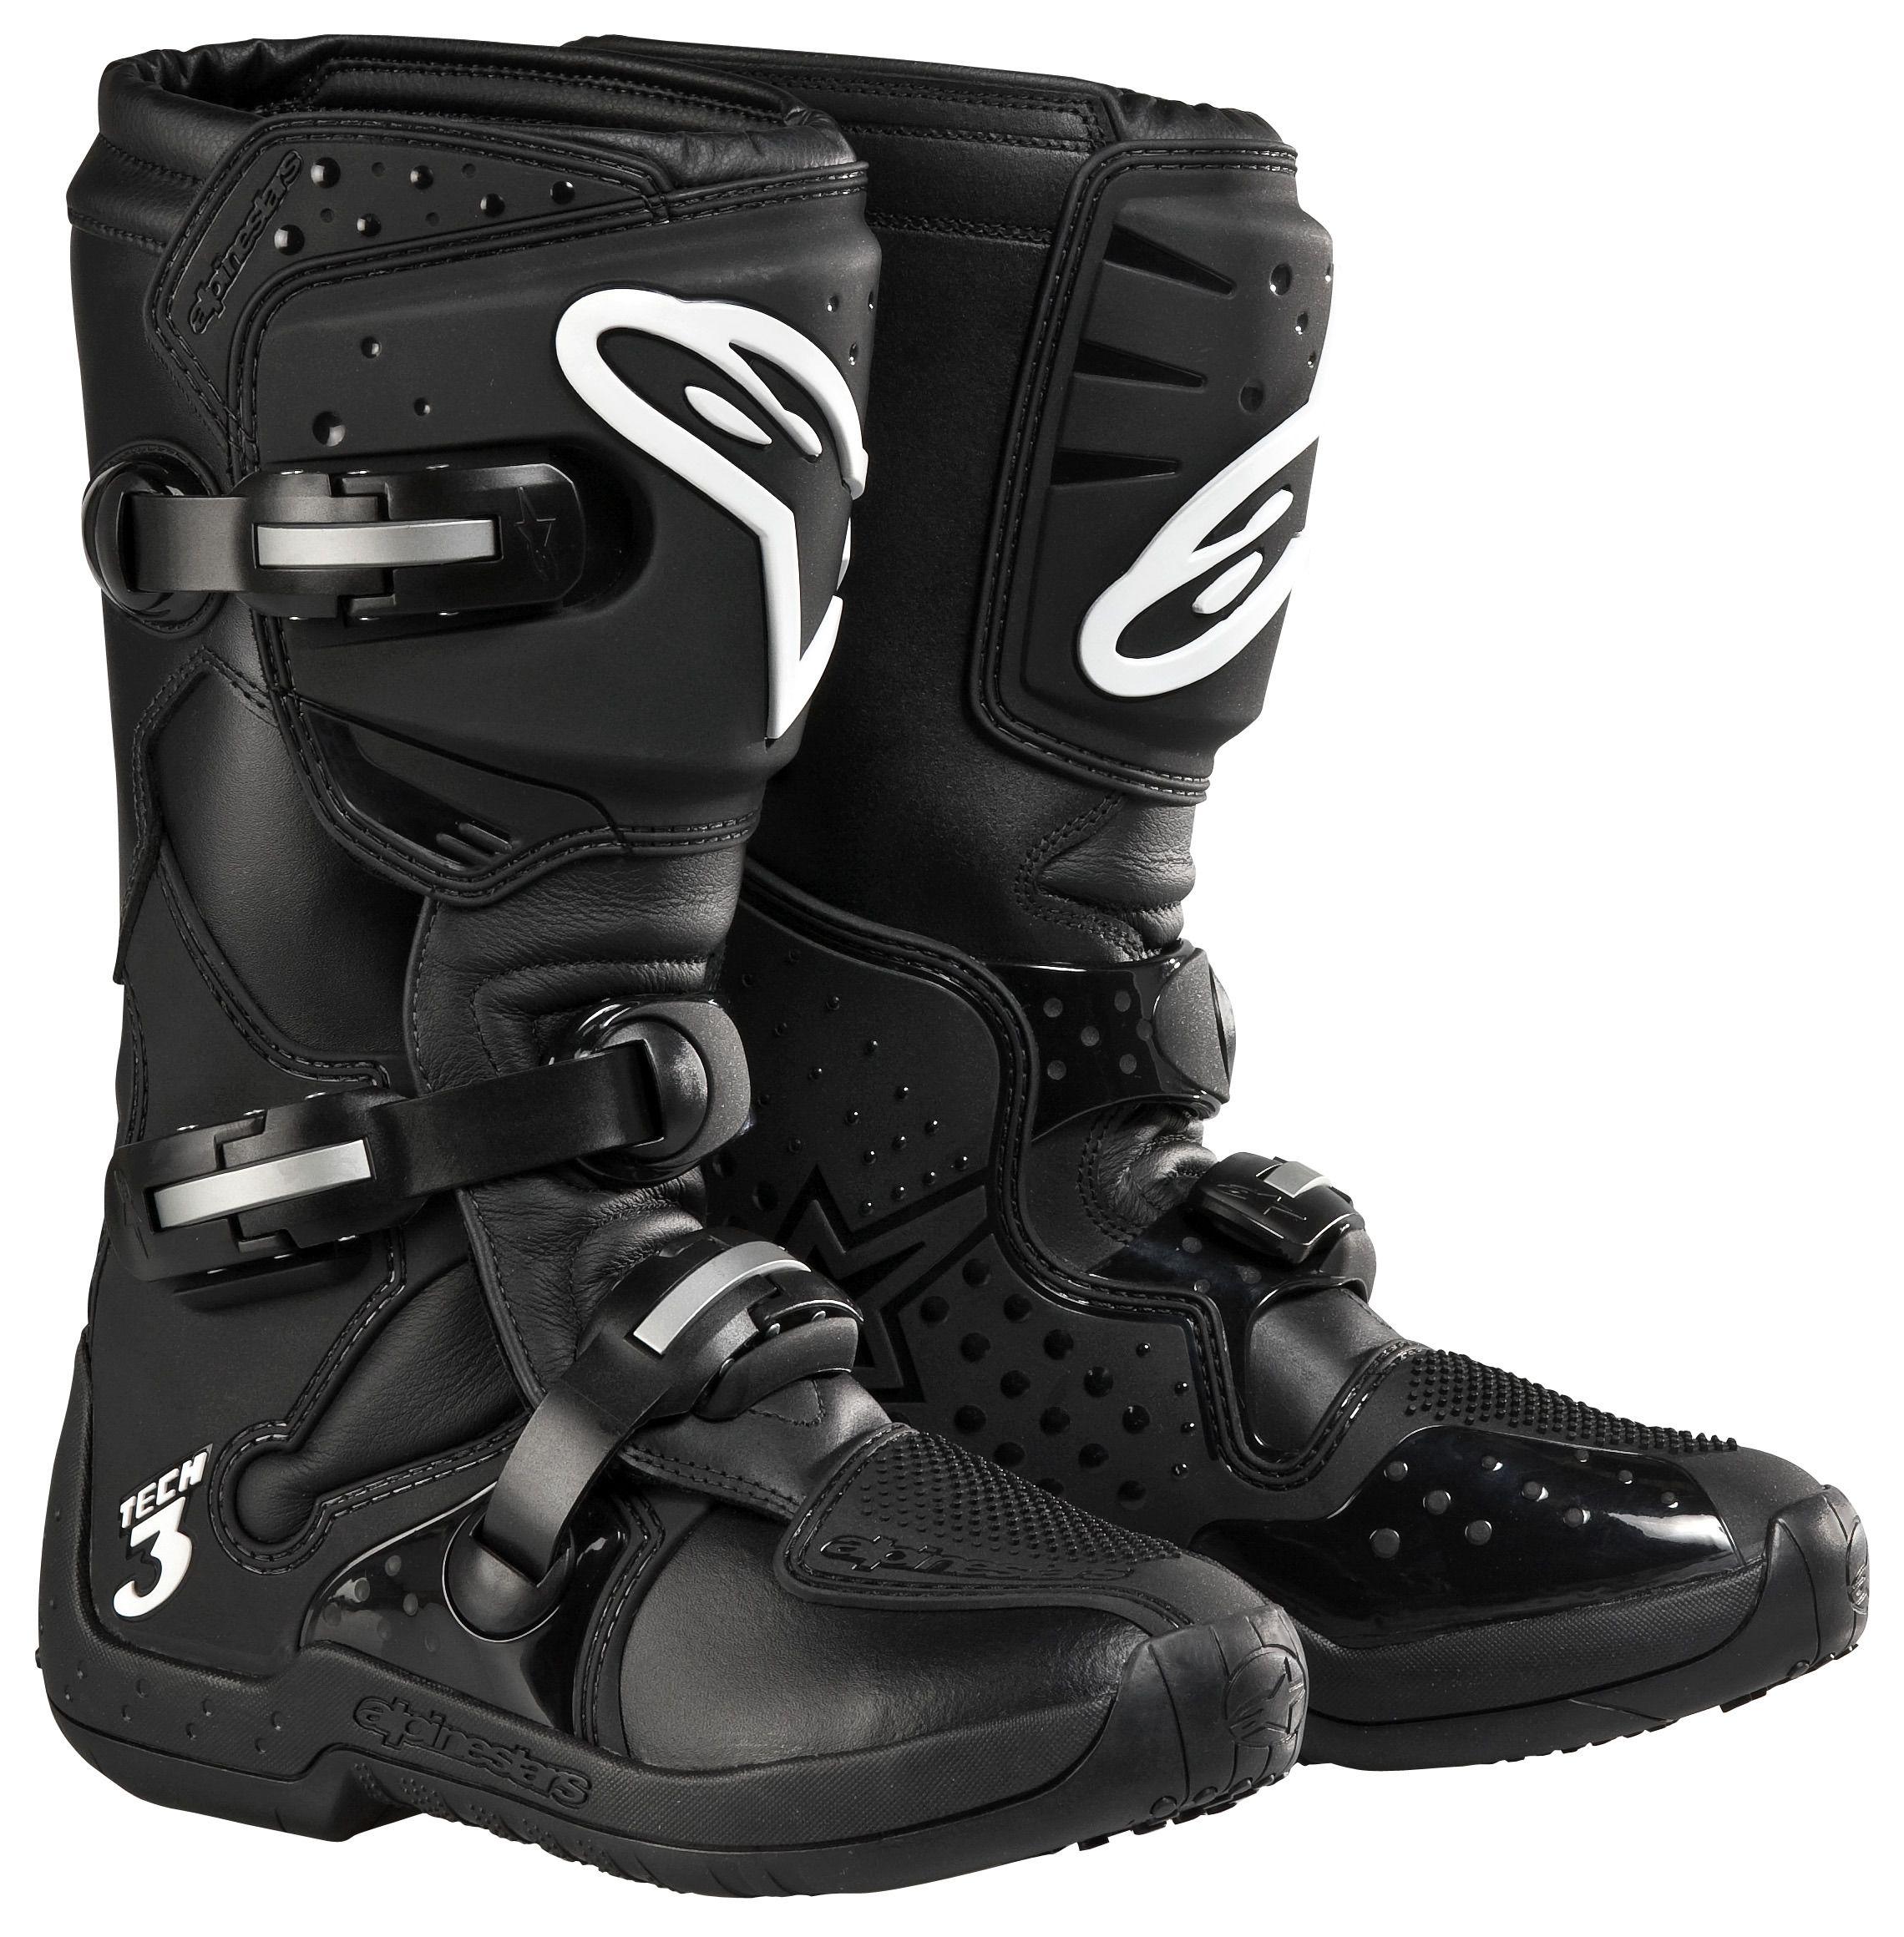 Alpine Motorcycle Gear >> Alpinestars Stella Tech 3 Boots - RevZilla